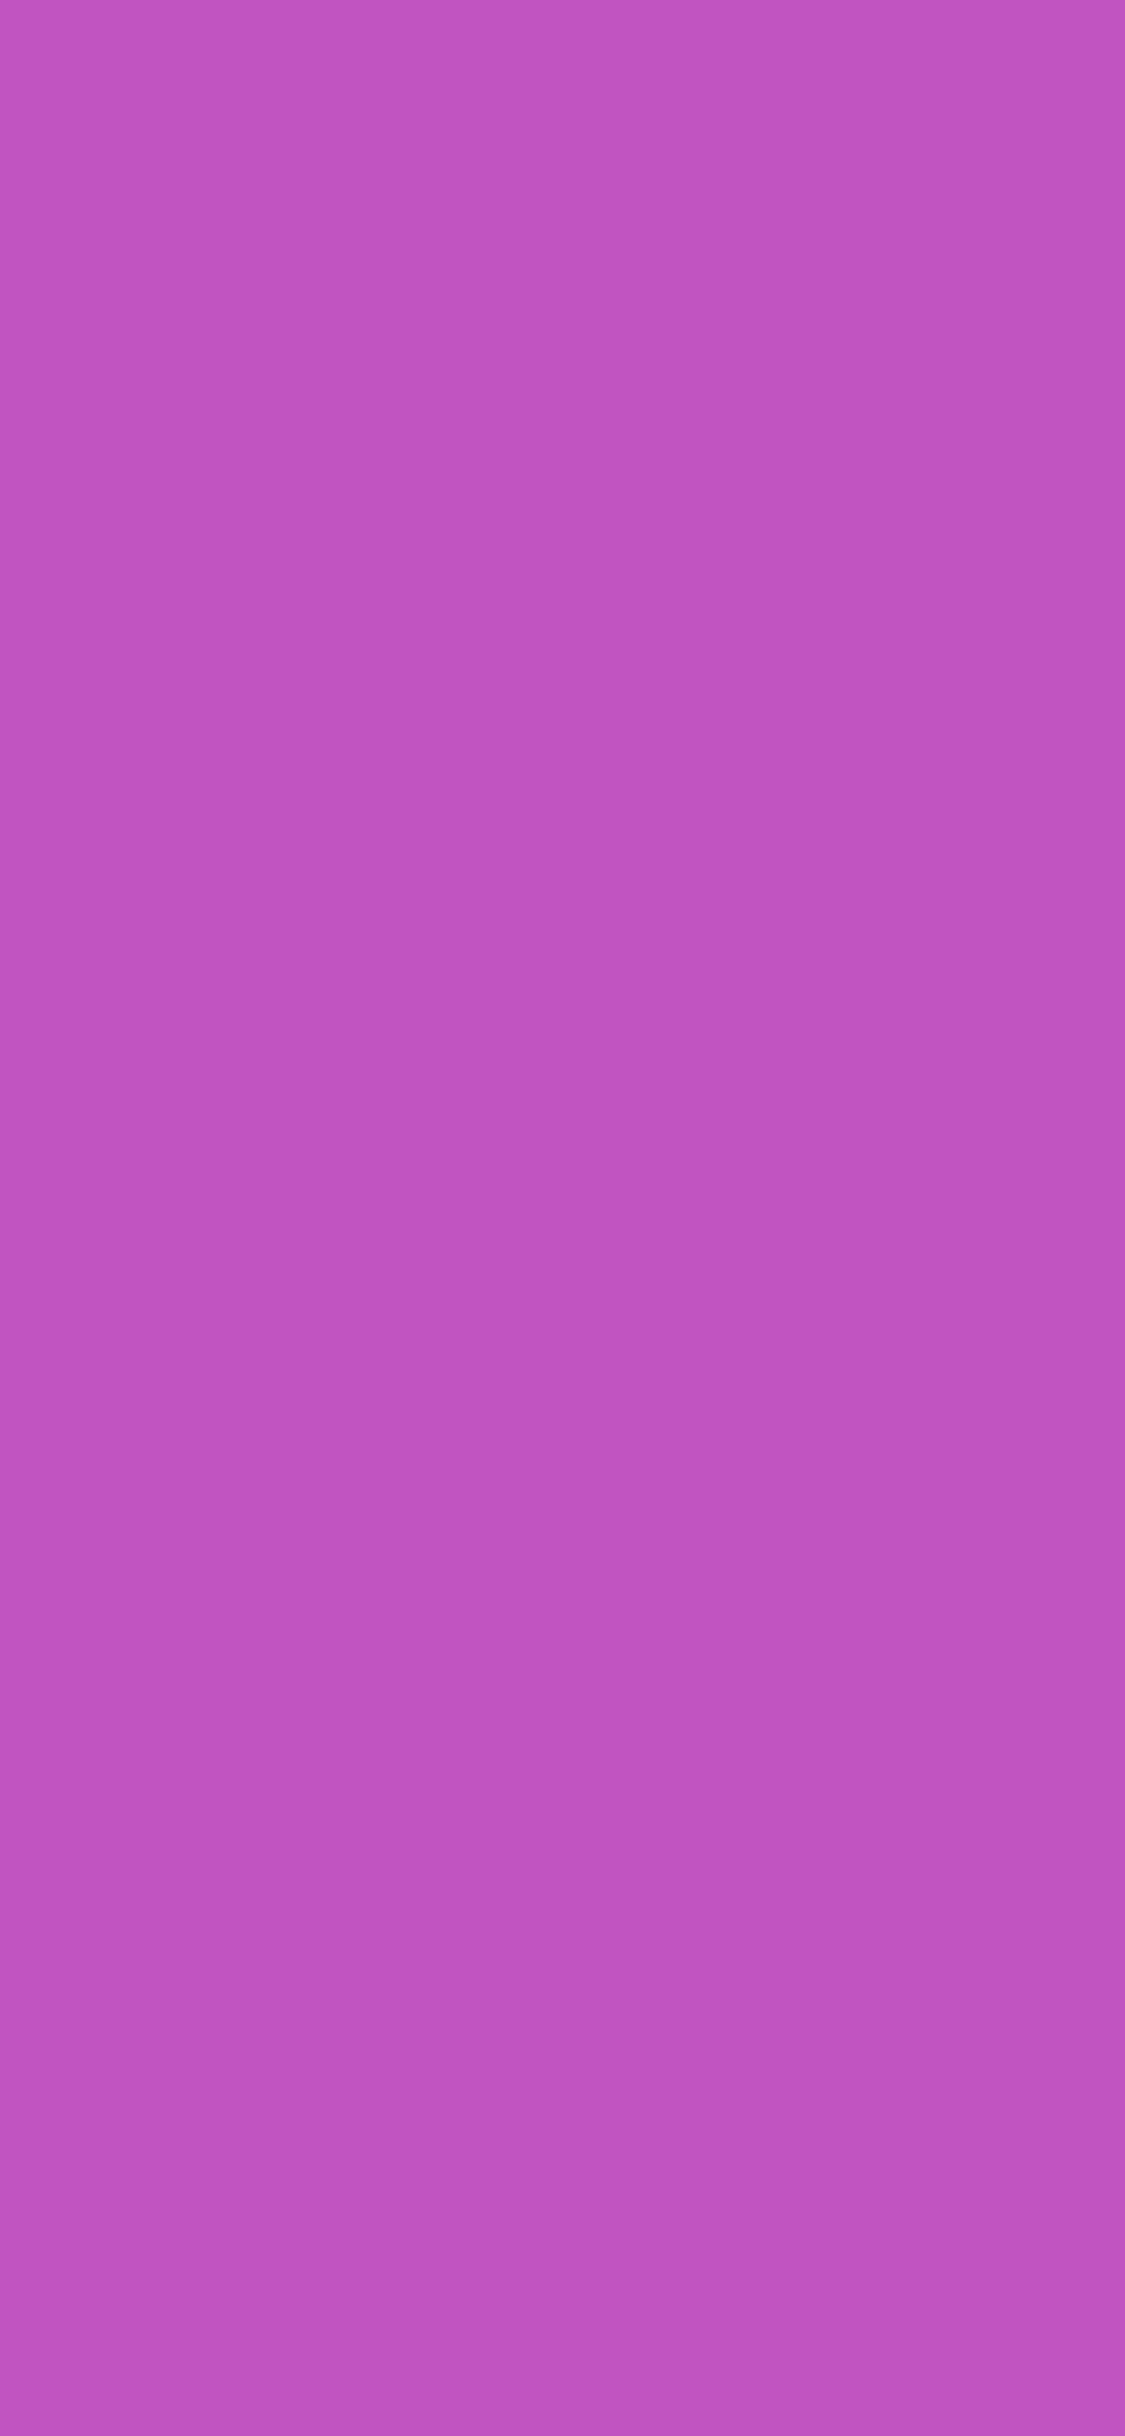 1125x2436 Fuchsia Crayola Solid Color Background